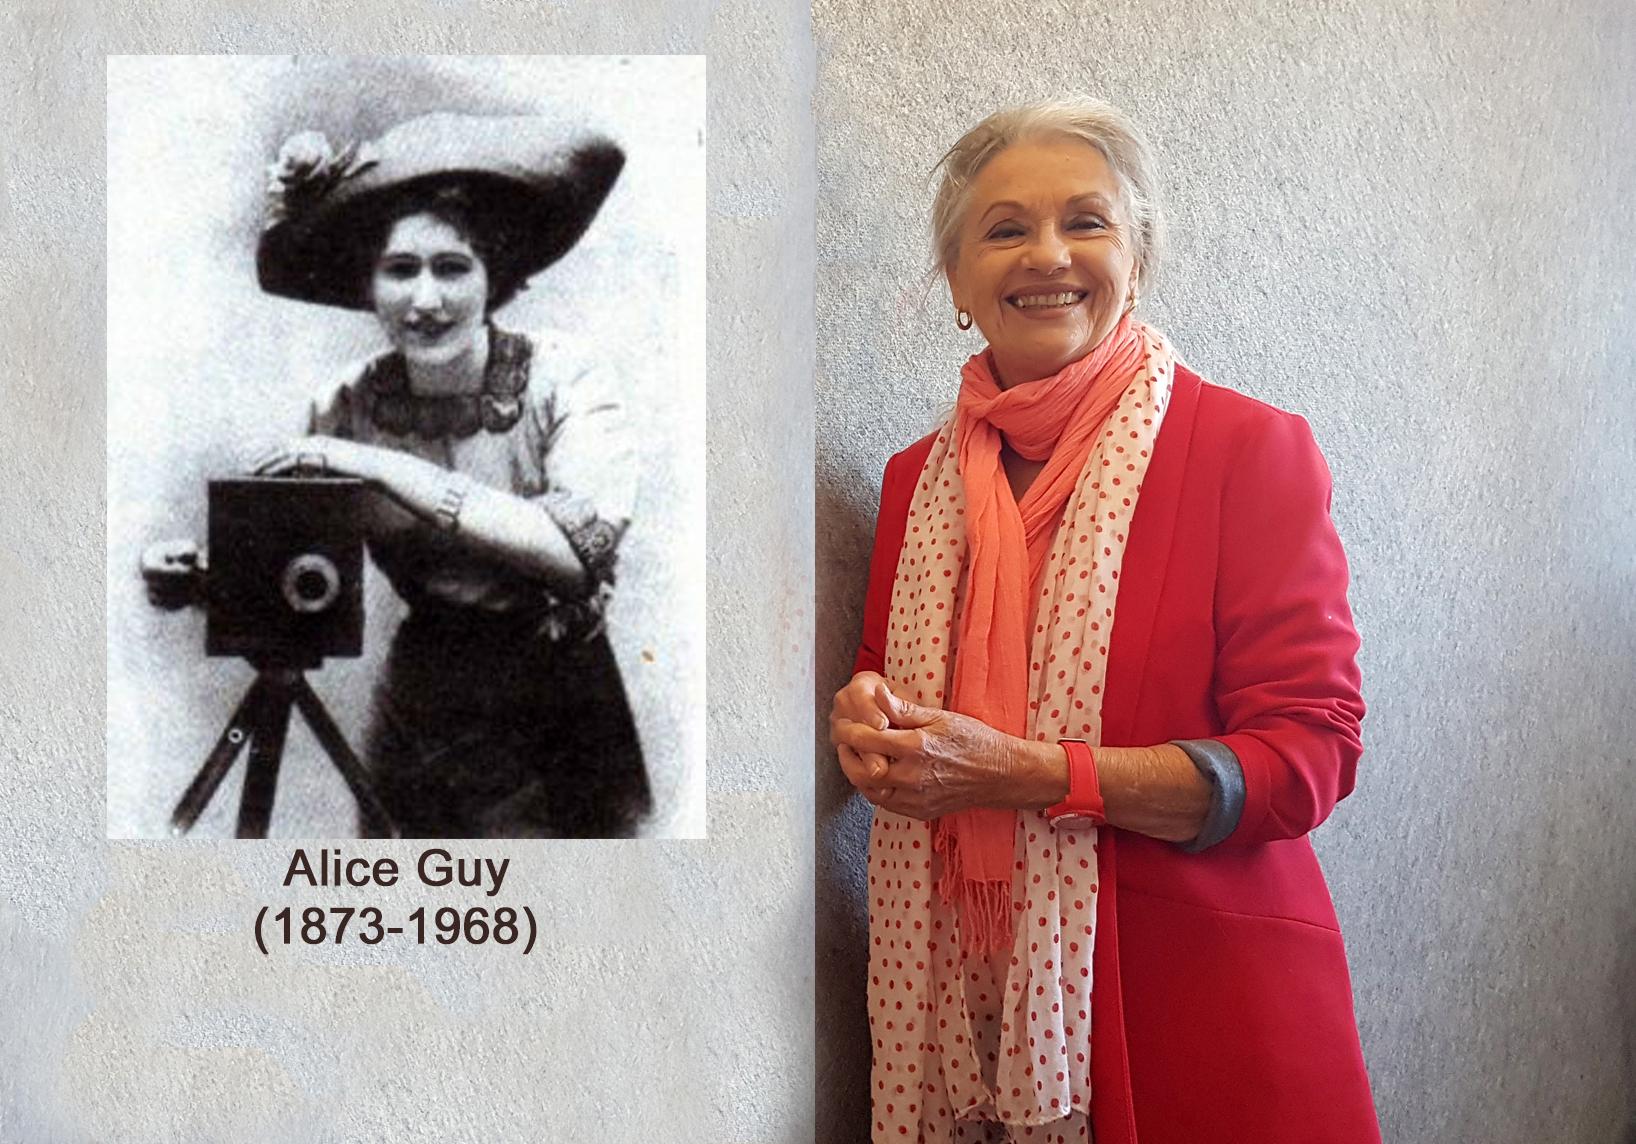 Alice Guy et Jacqueline Hennegrave